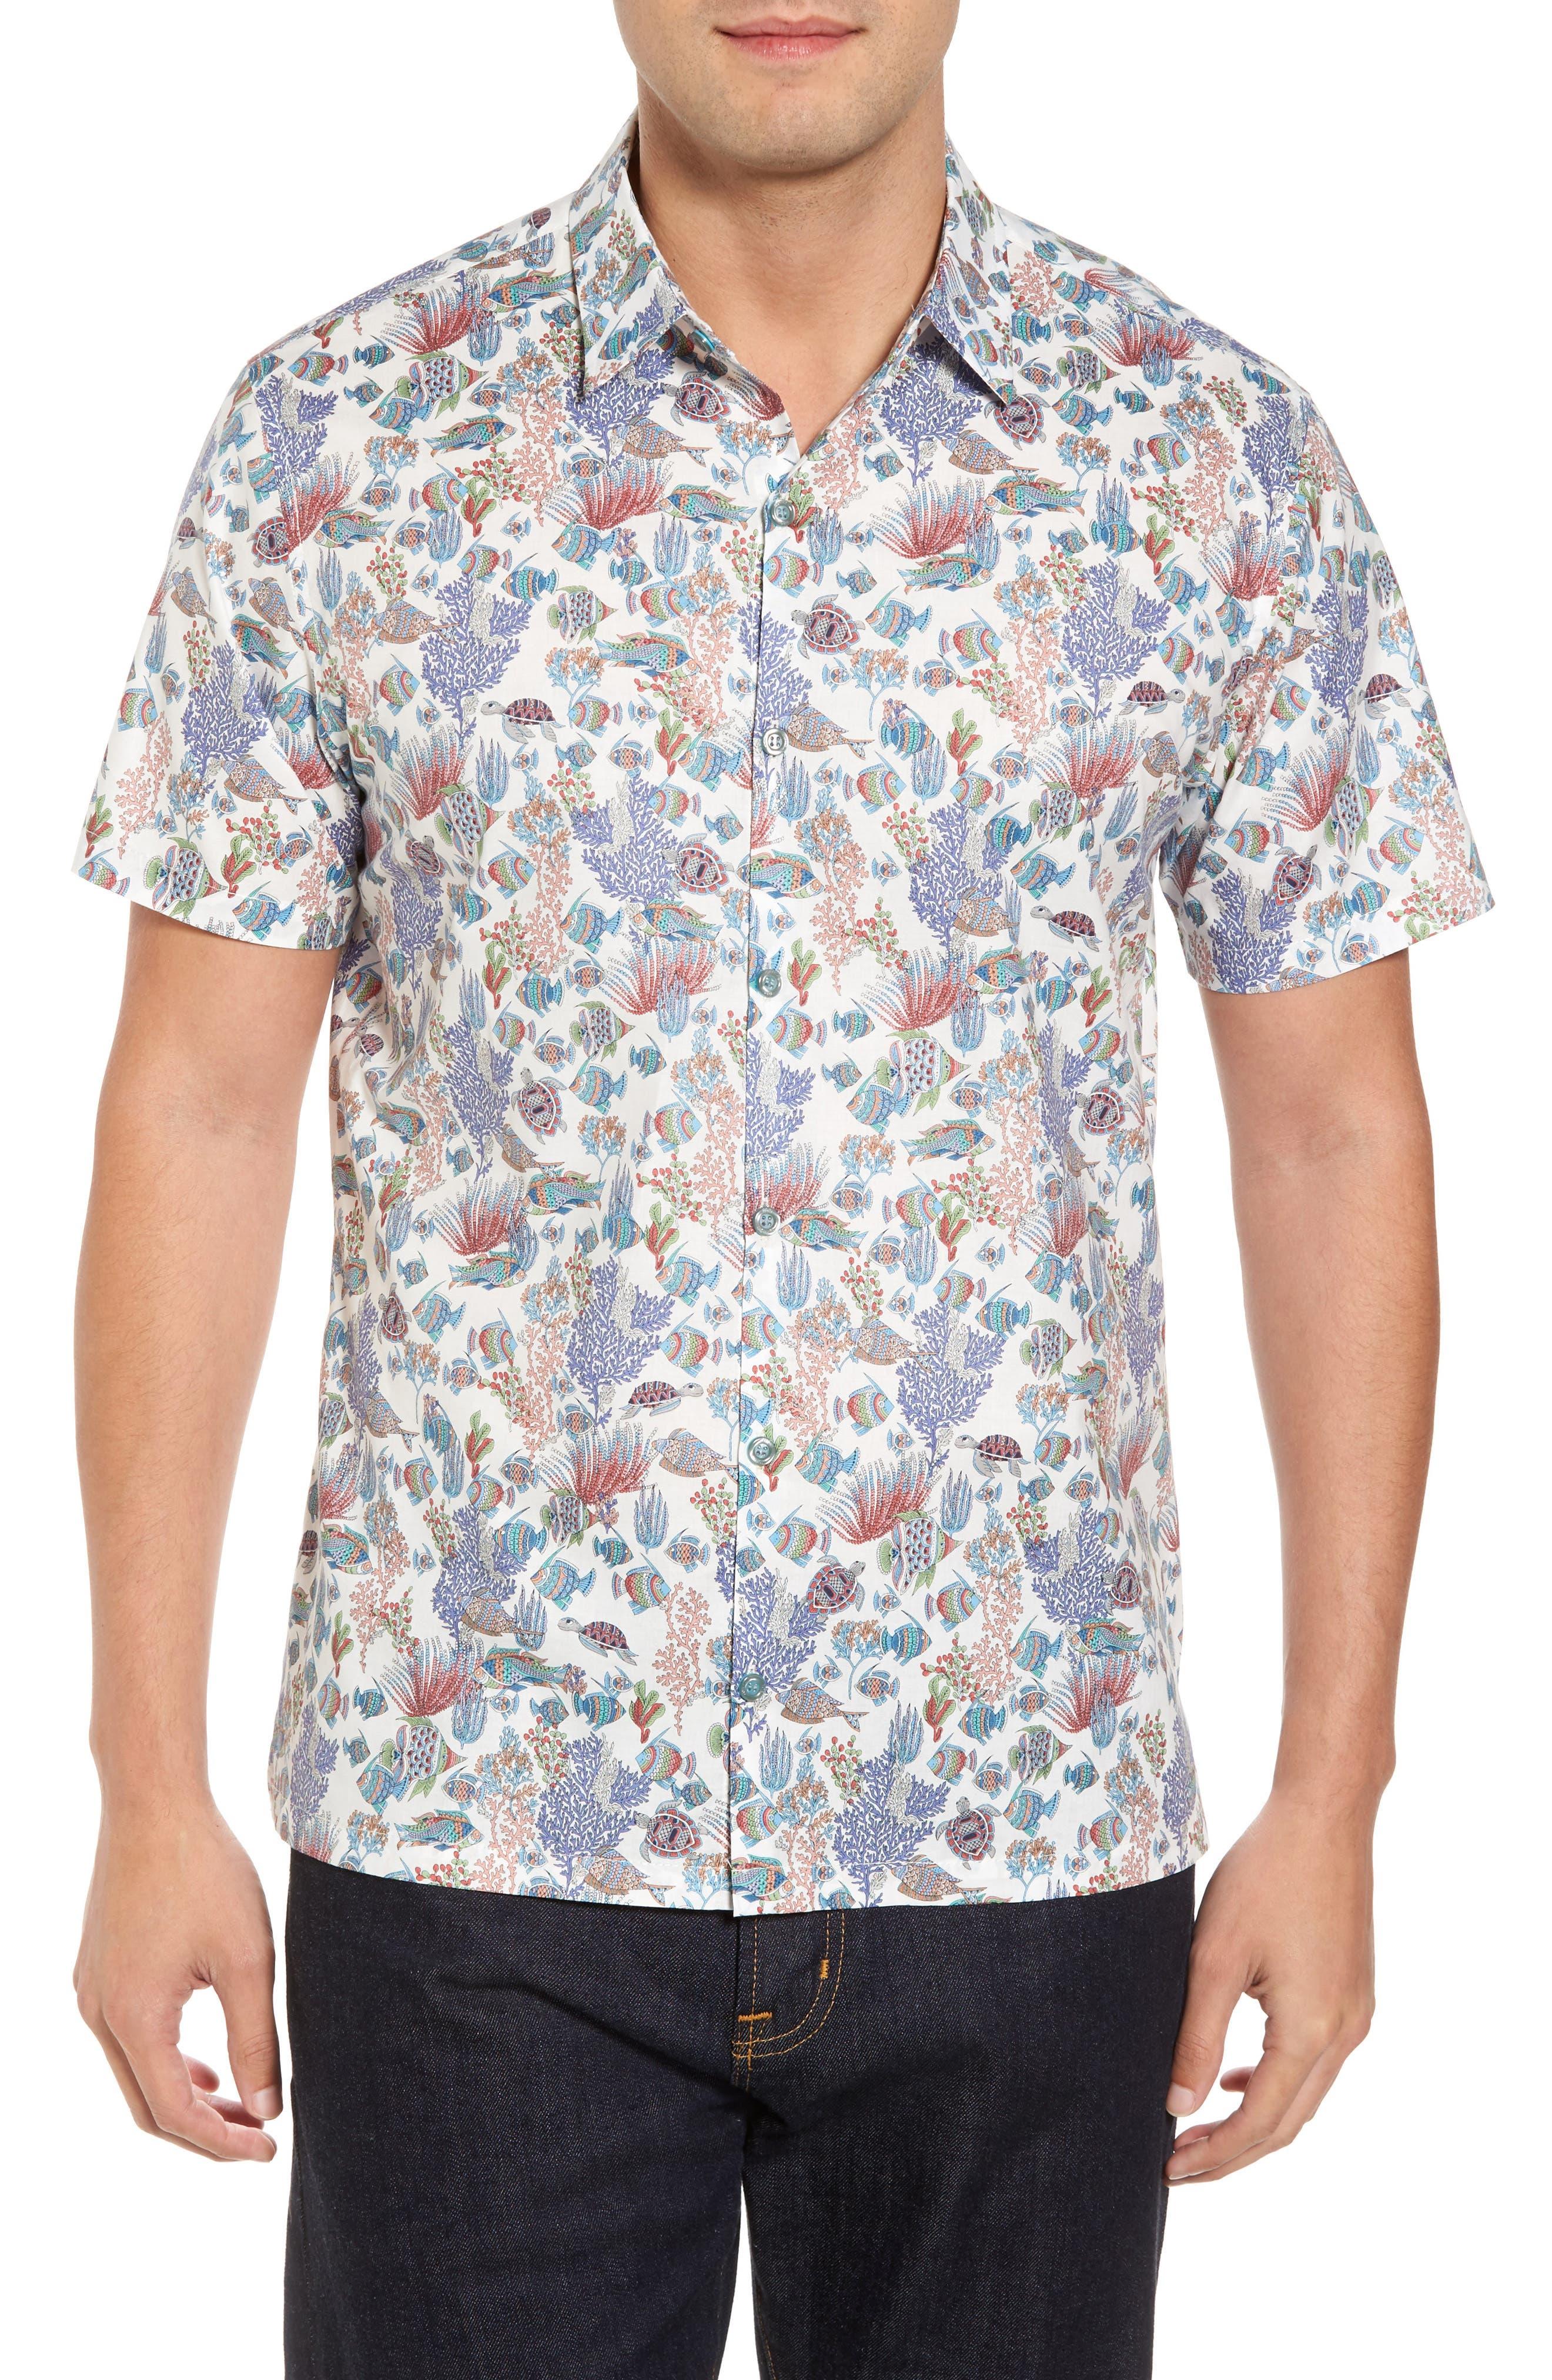 Aquaculture Slim Fit Camp Shirt,                             Main thumbnail 1, color,                             100